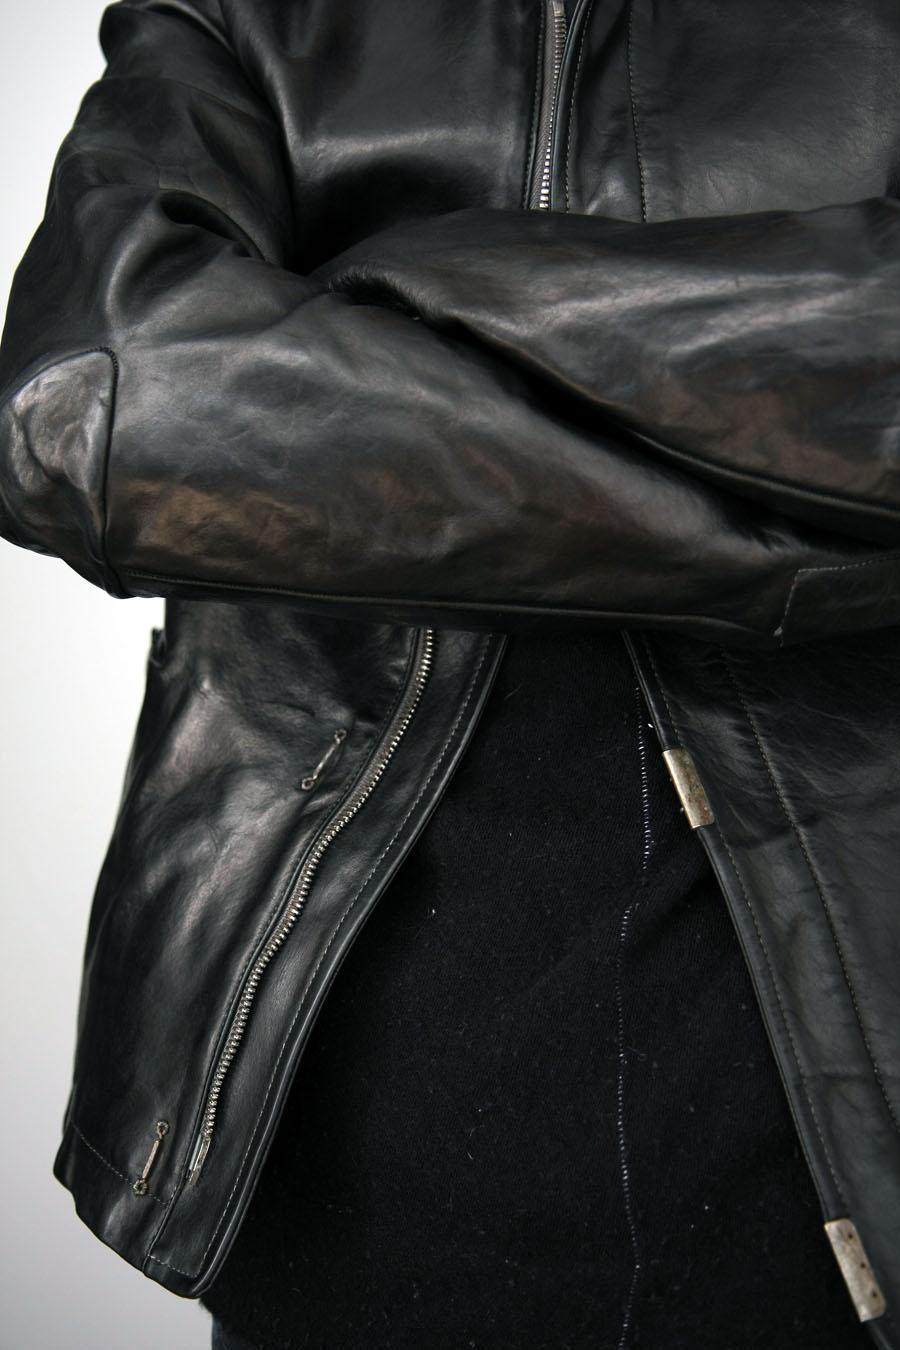 ccp scarstitch closeup bottom